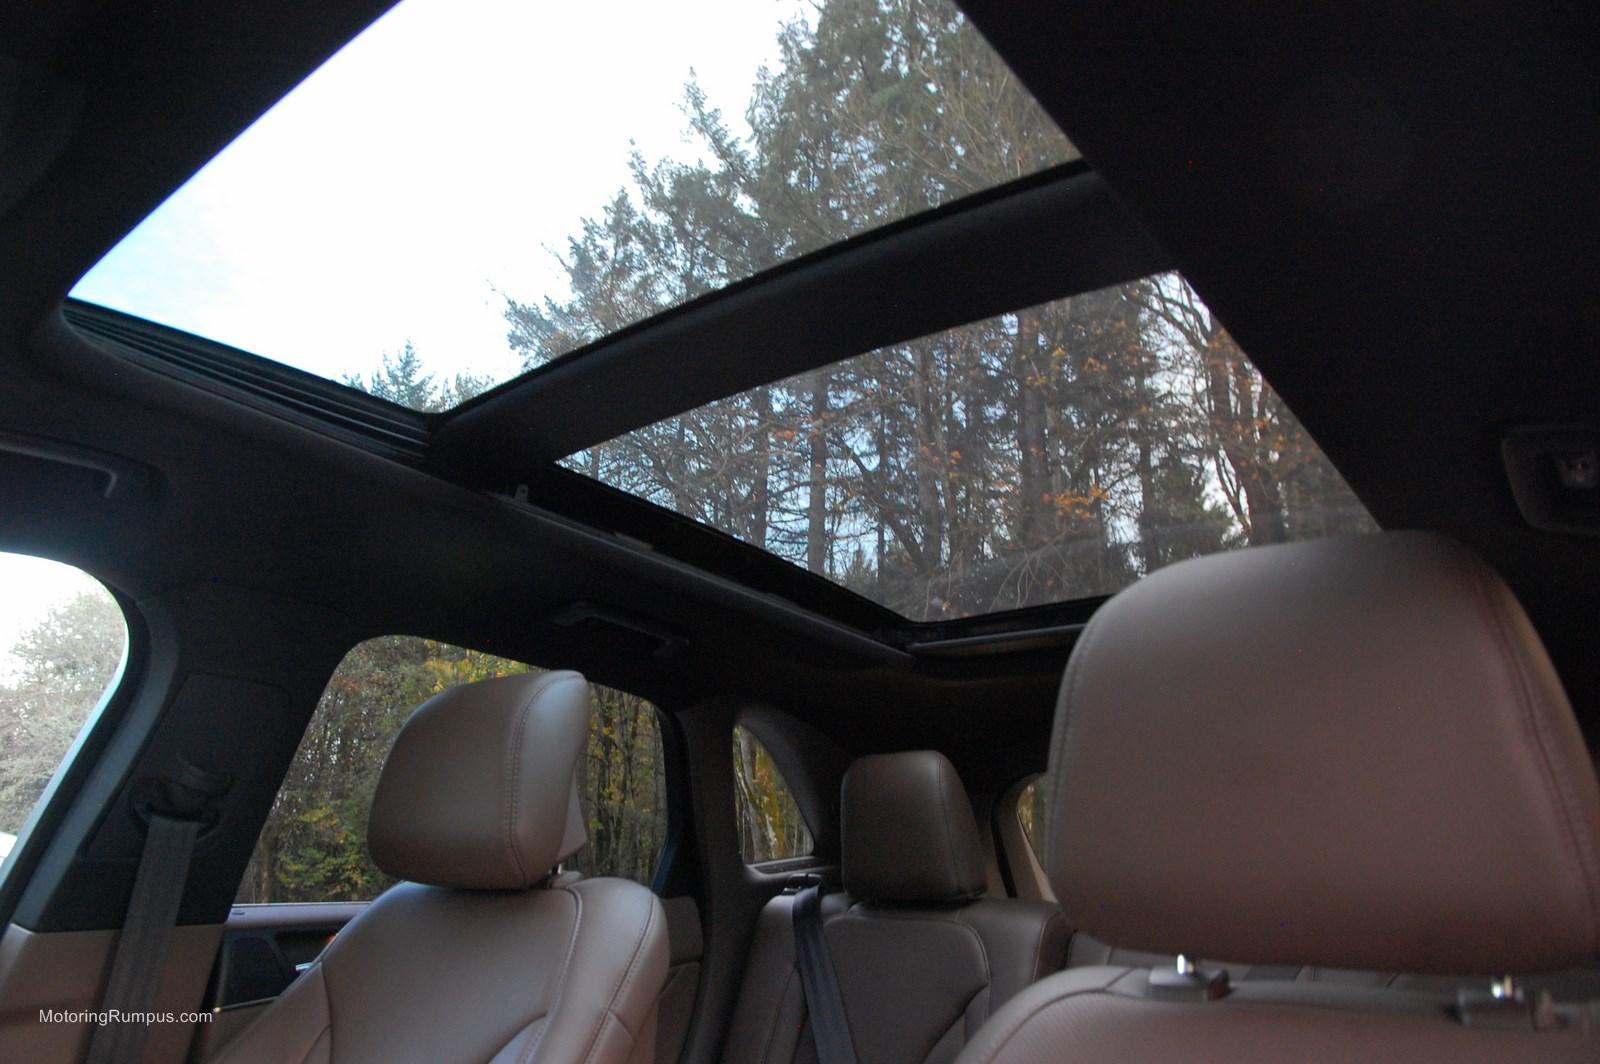 2015 Lincoln MKC Panoramic Vista Roof